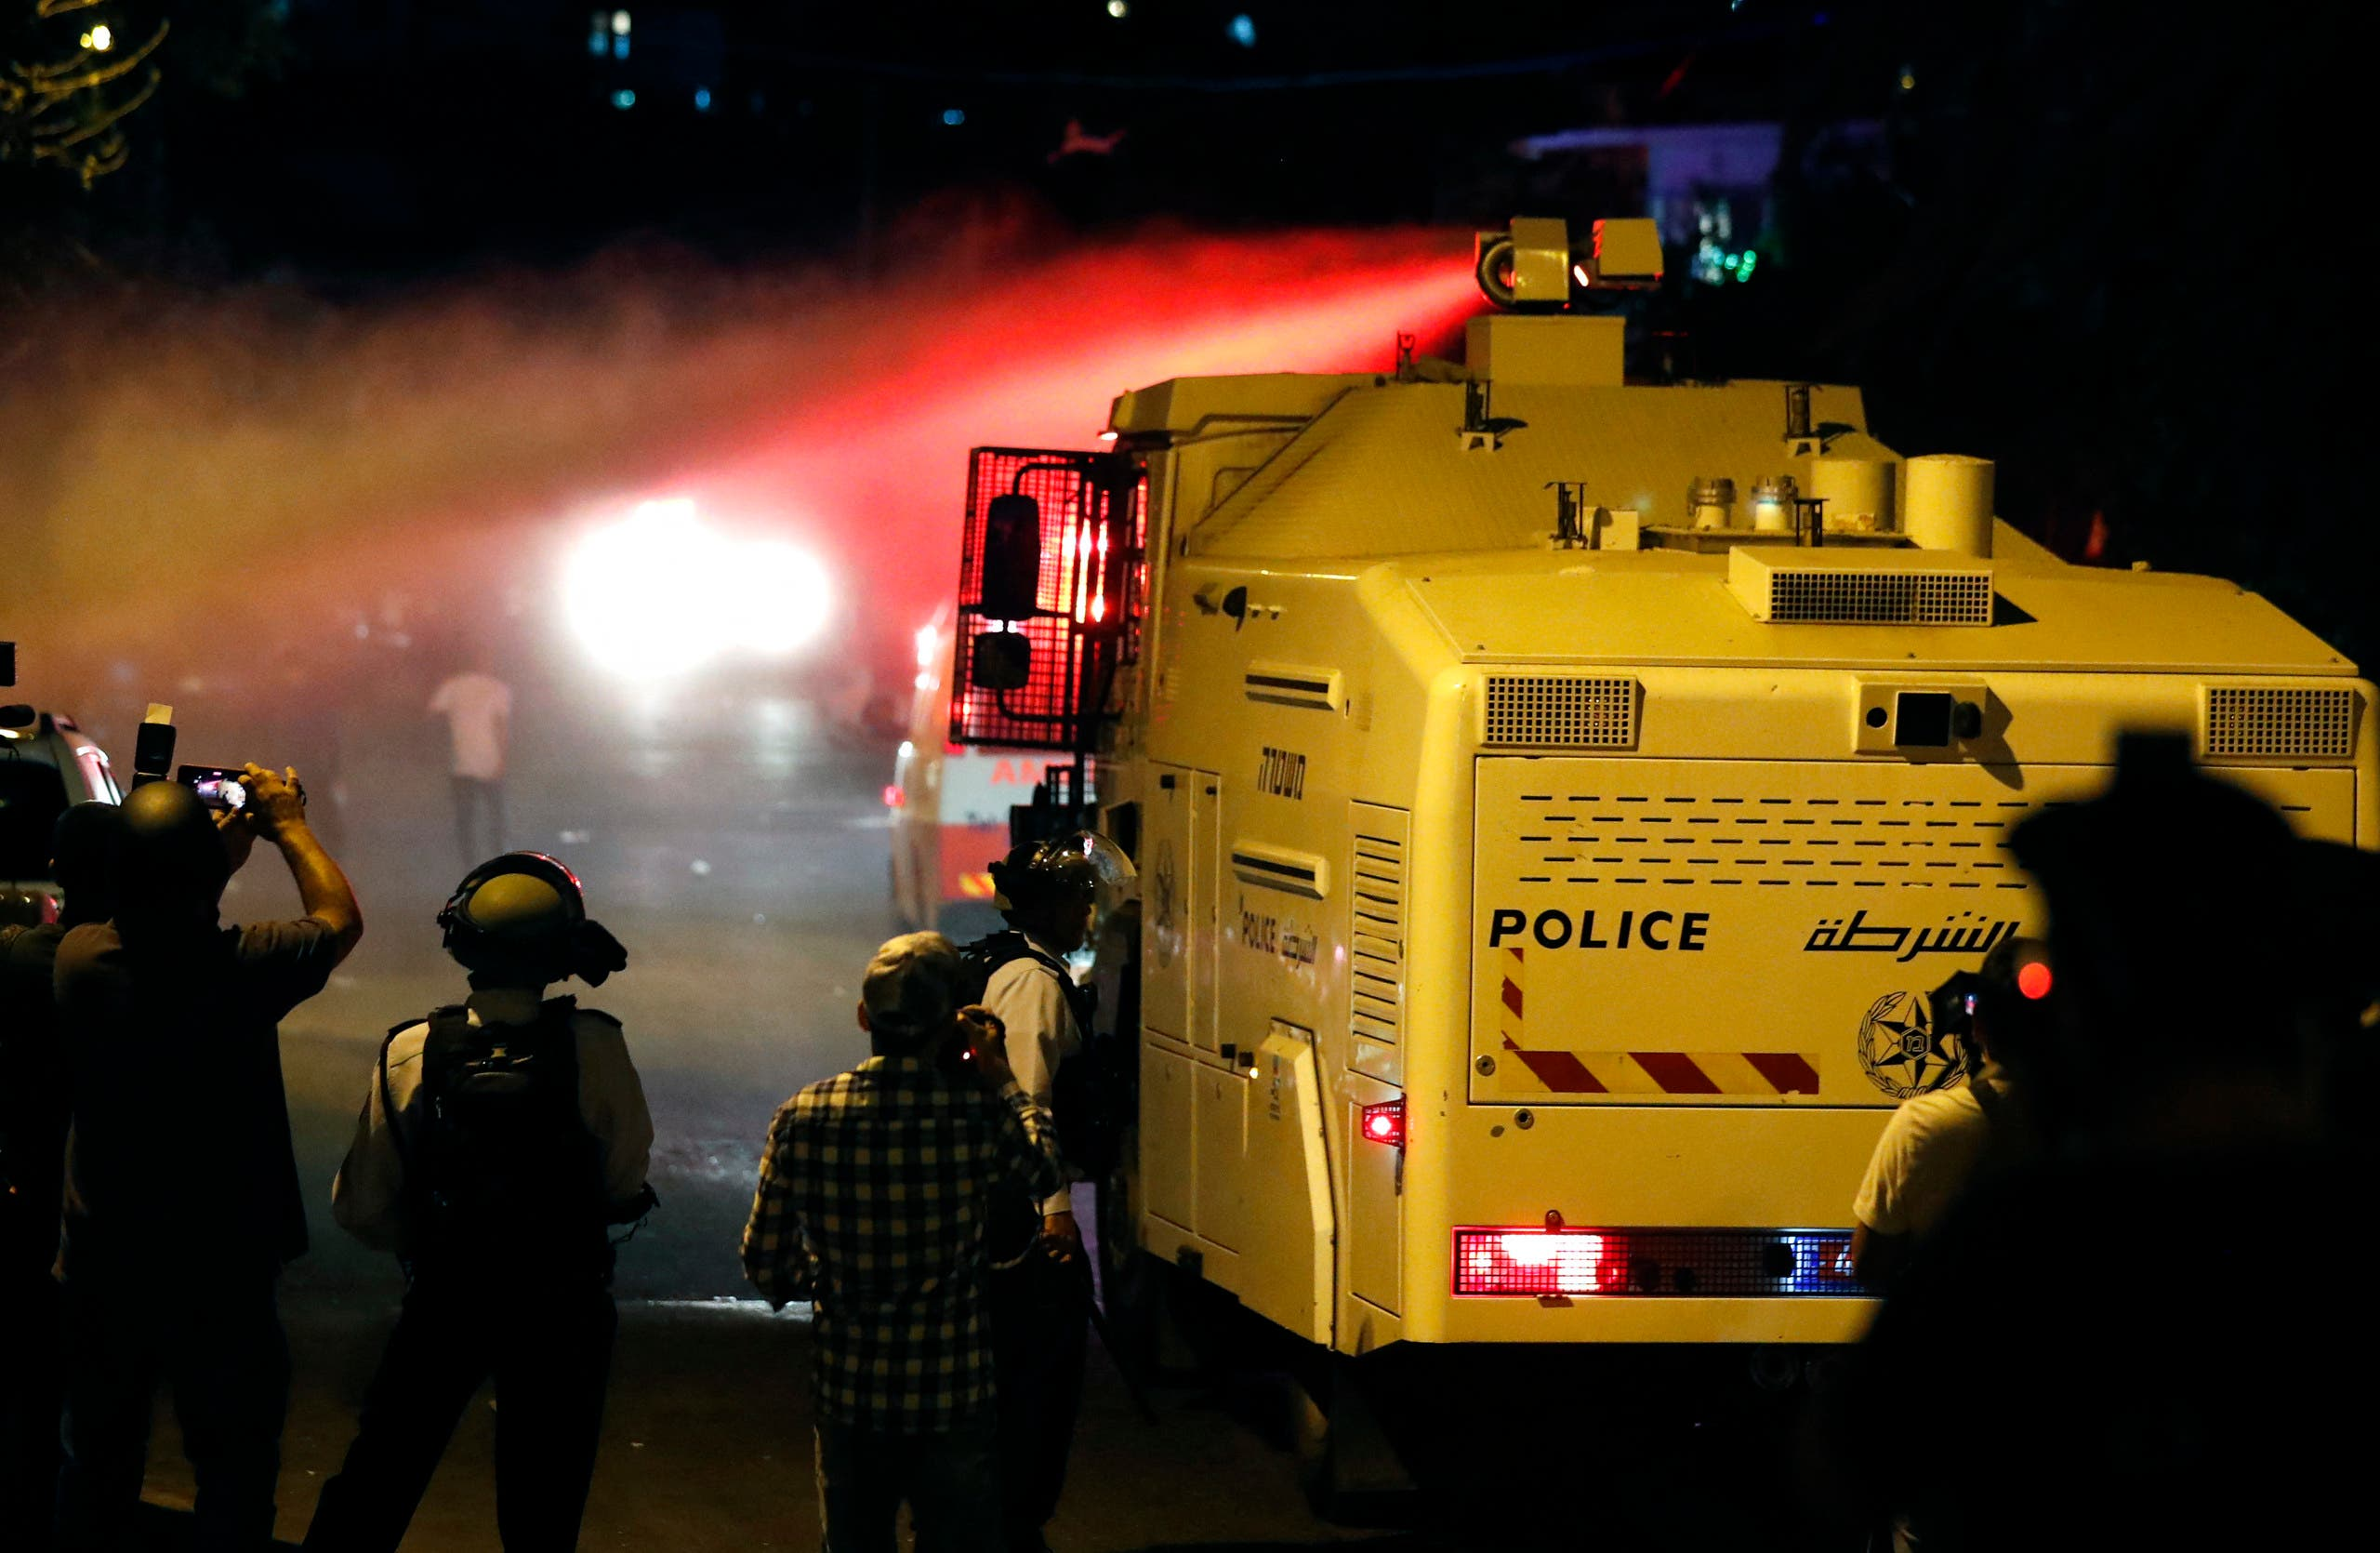 Israeli security forces spray Palestinians with skunk water in the east Jerusalem neighbourhood of Sheikh Jarrah on June 21, 2021. (AFP)